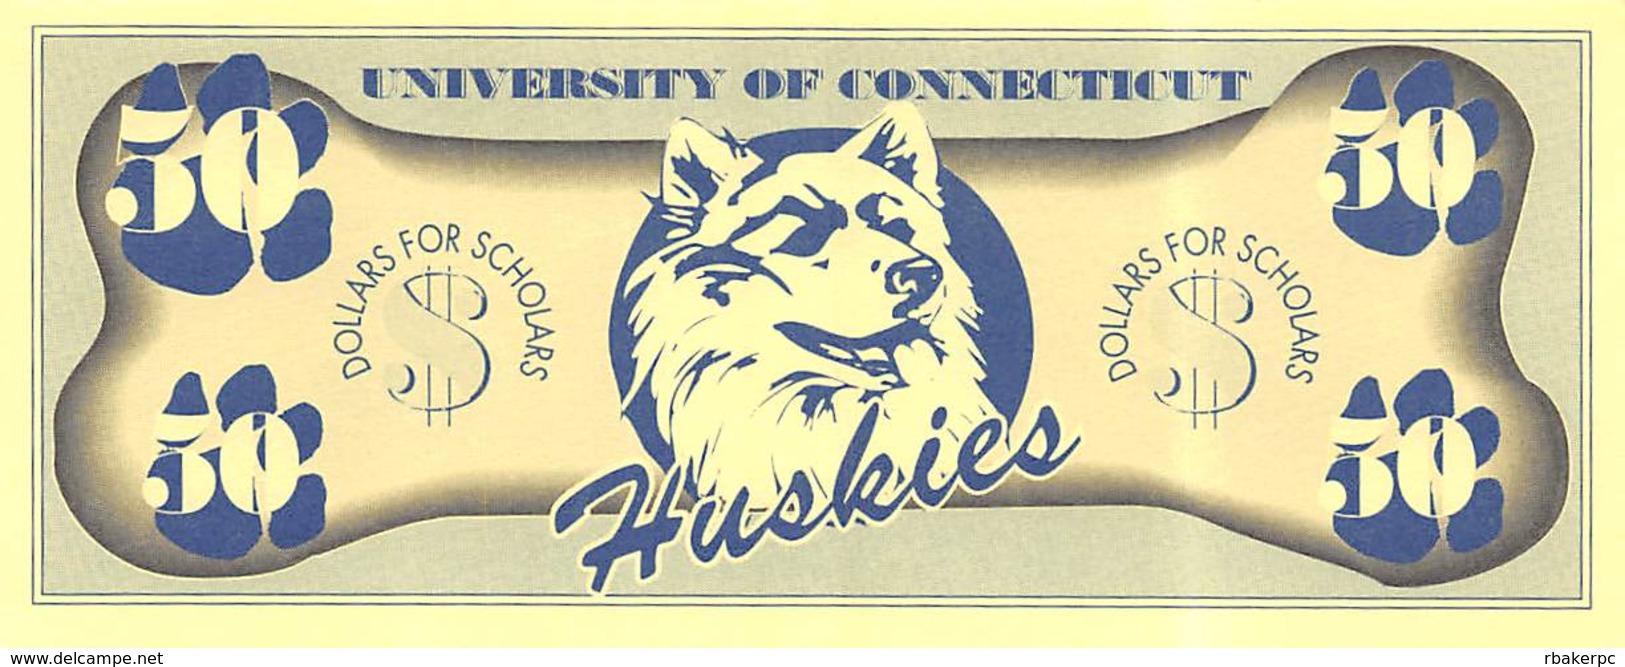 Foxwoods Casino - Ledyard, CT - $50 University Of Conecticut Huskies Dollars For Scholars Bill - Casino Cards